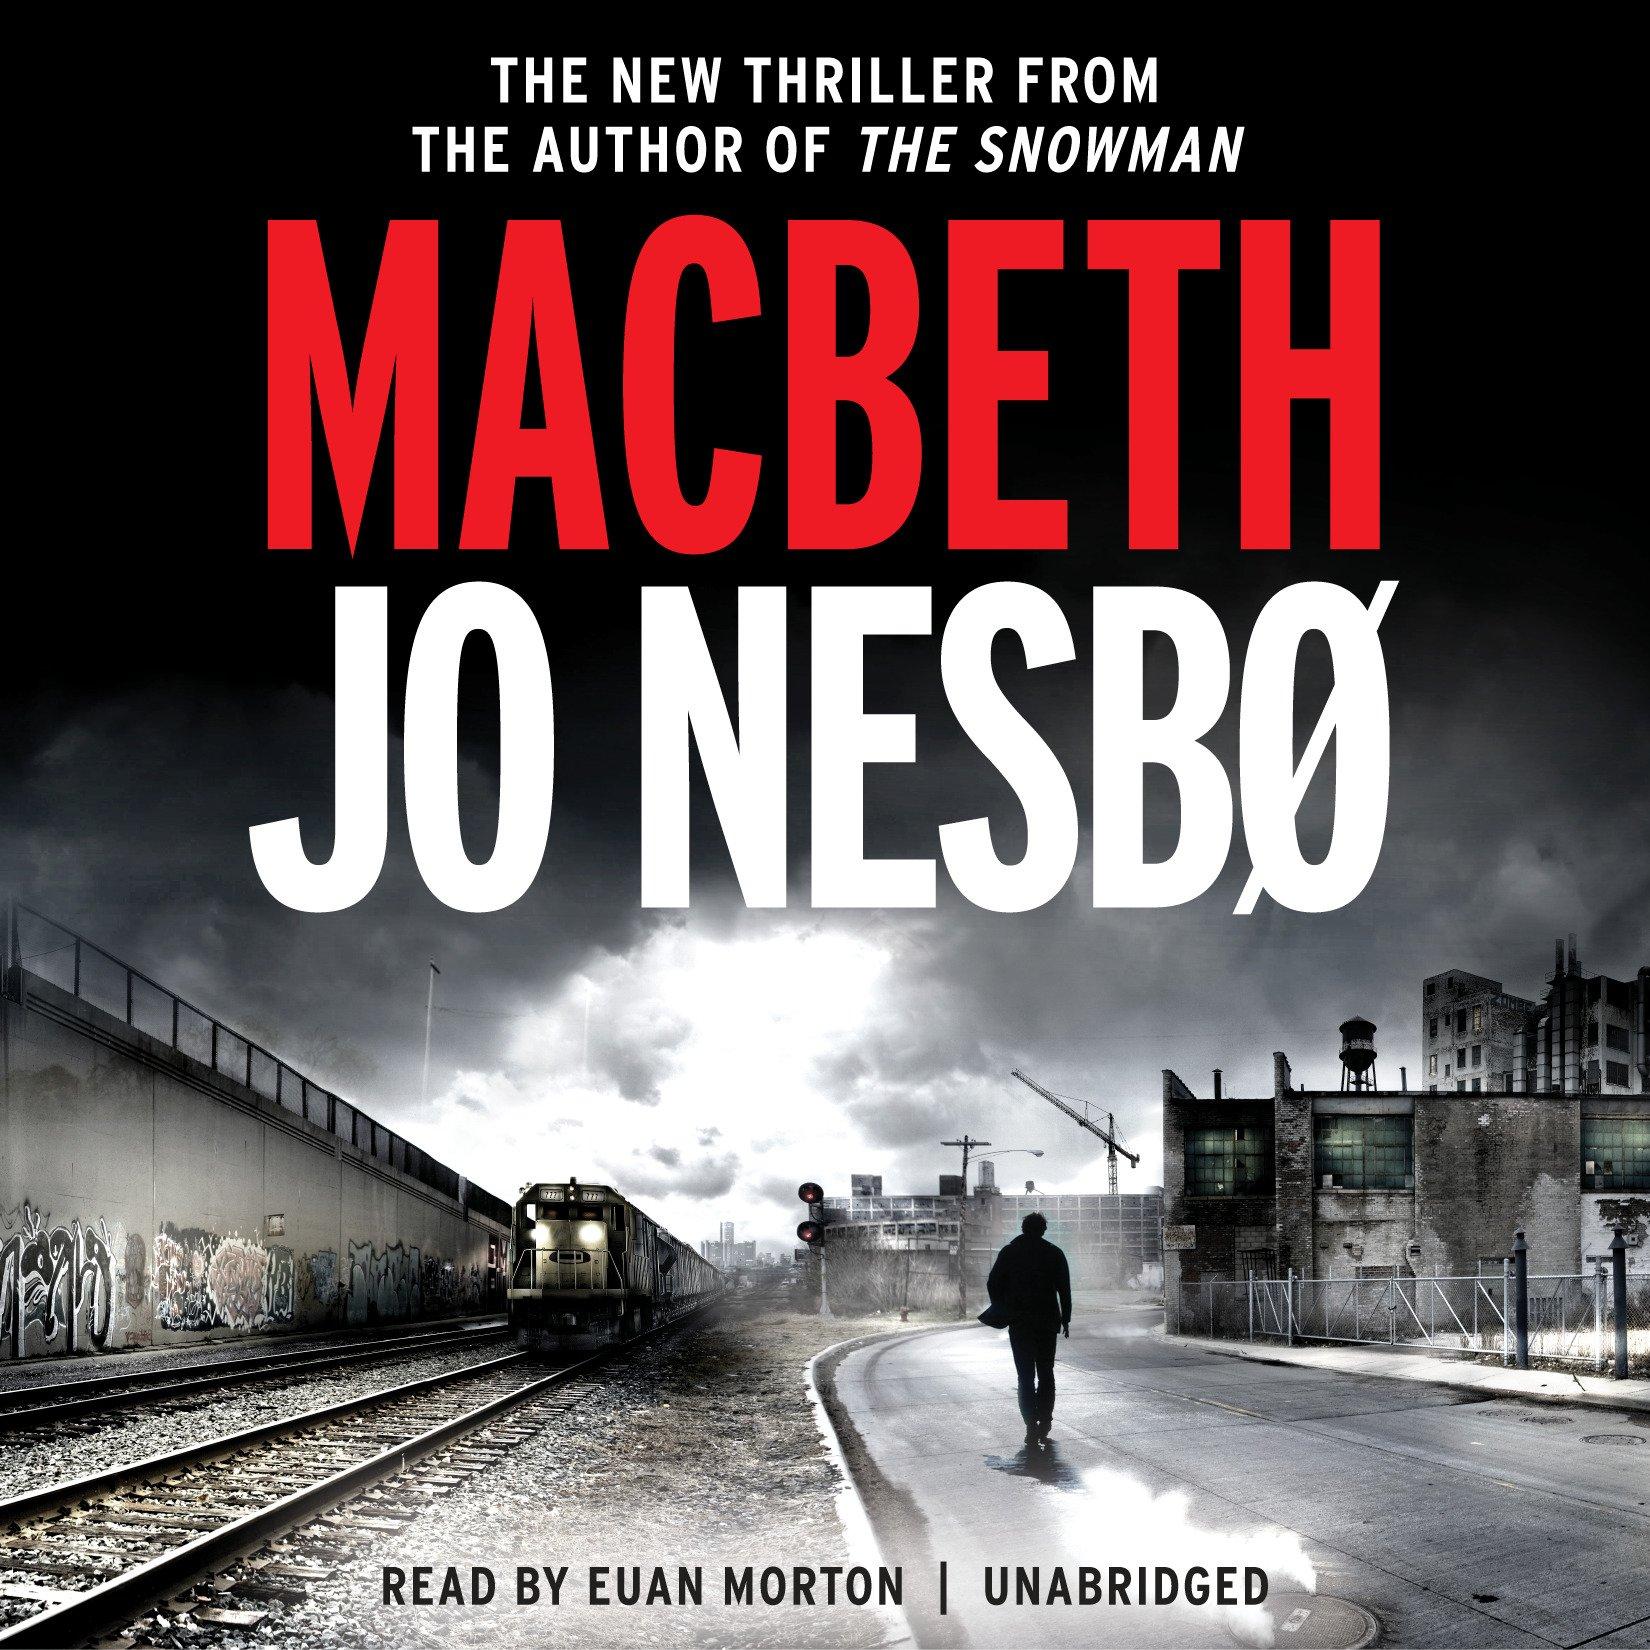 Macbeth by Random House Audio